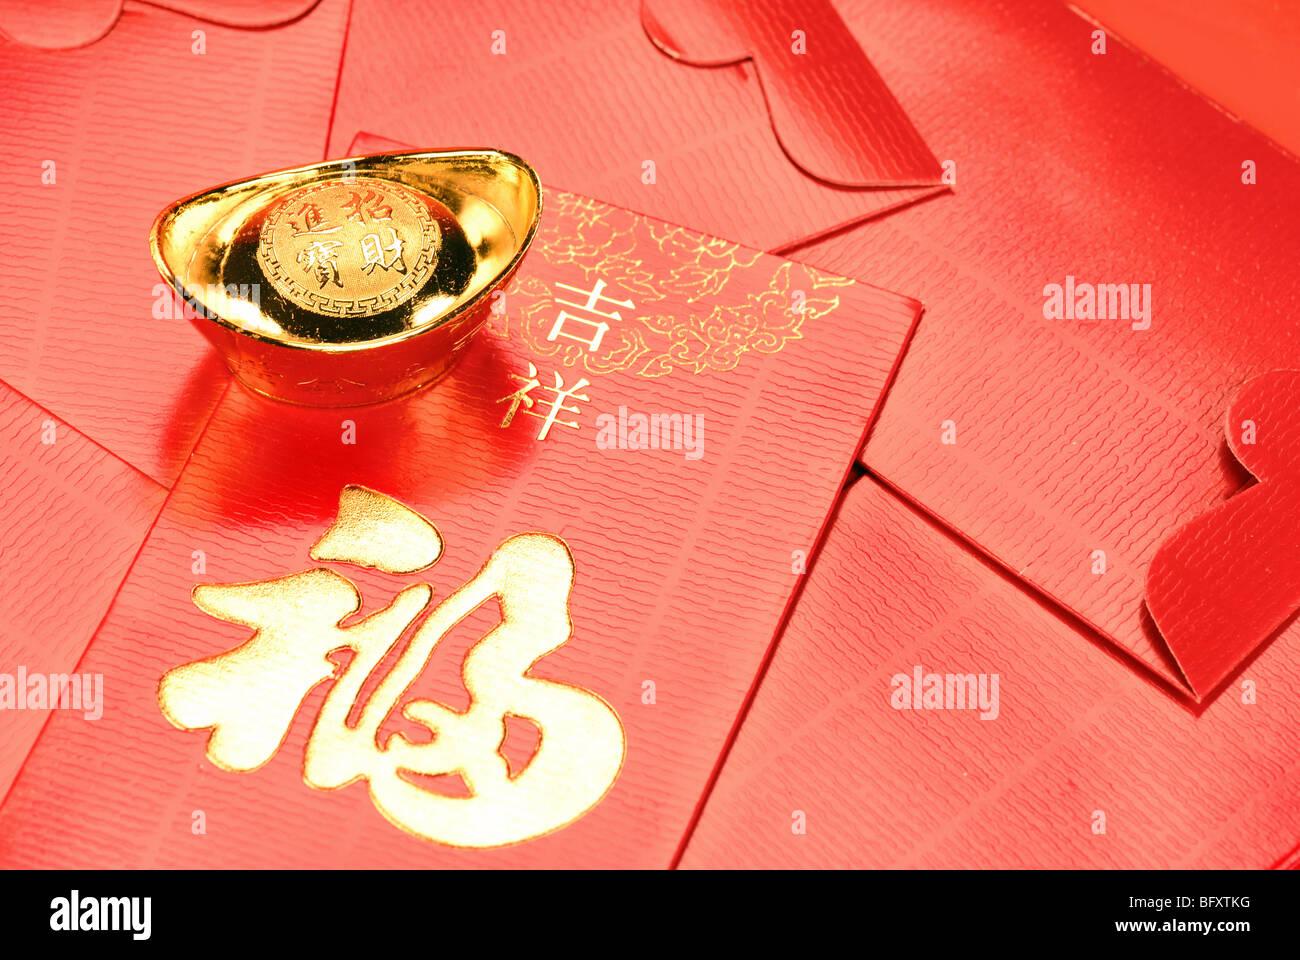 Red envelope and gold ingot - Stock Image